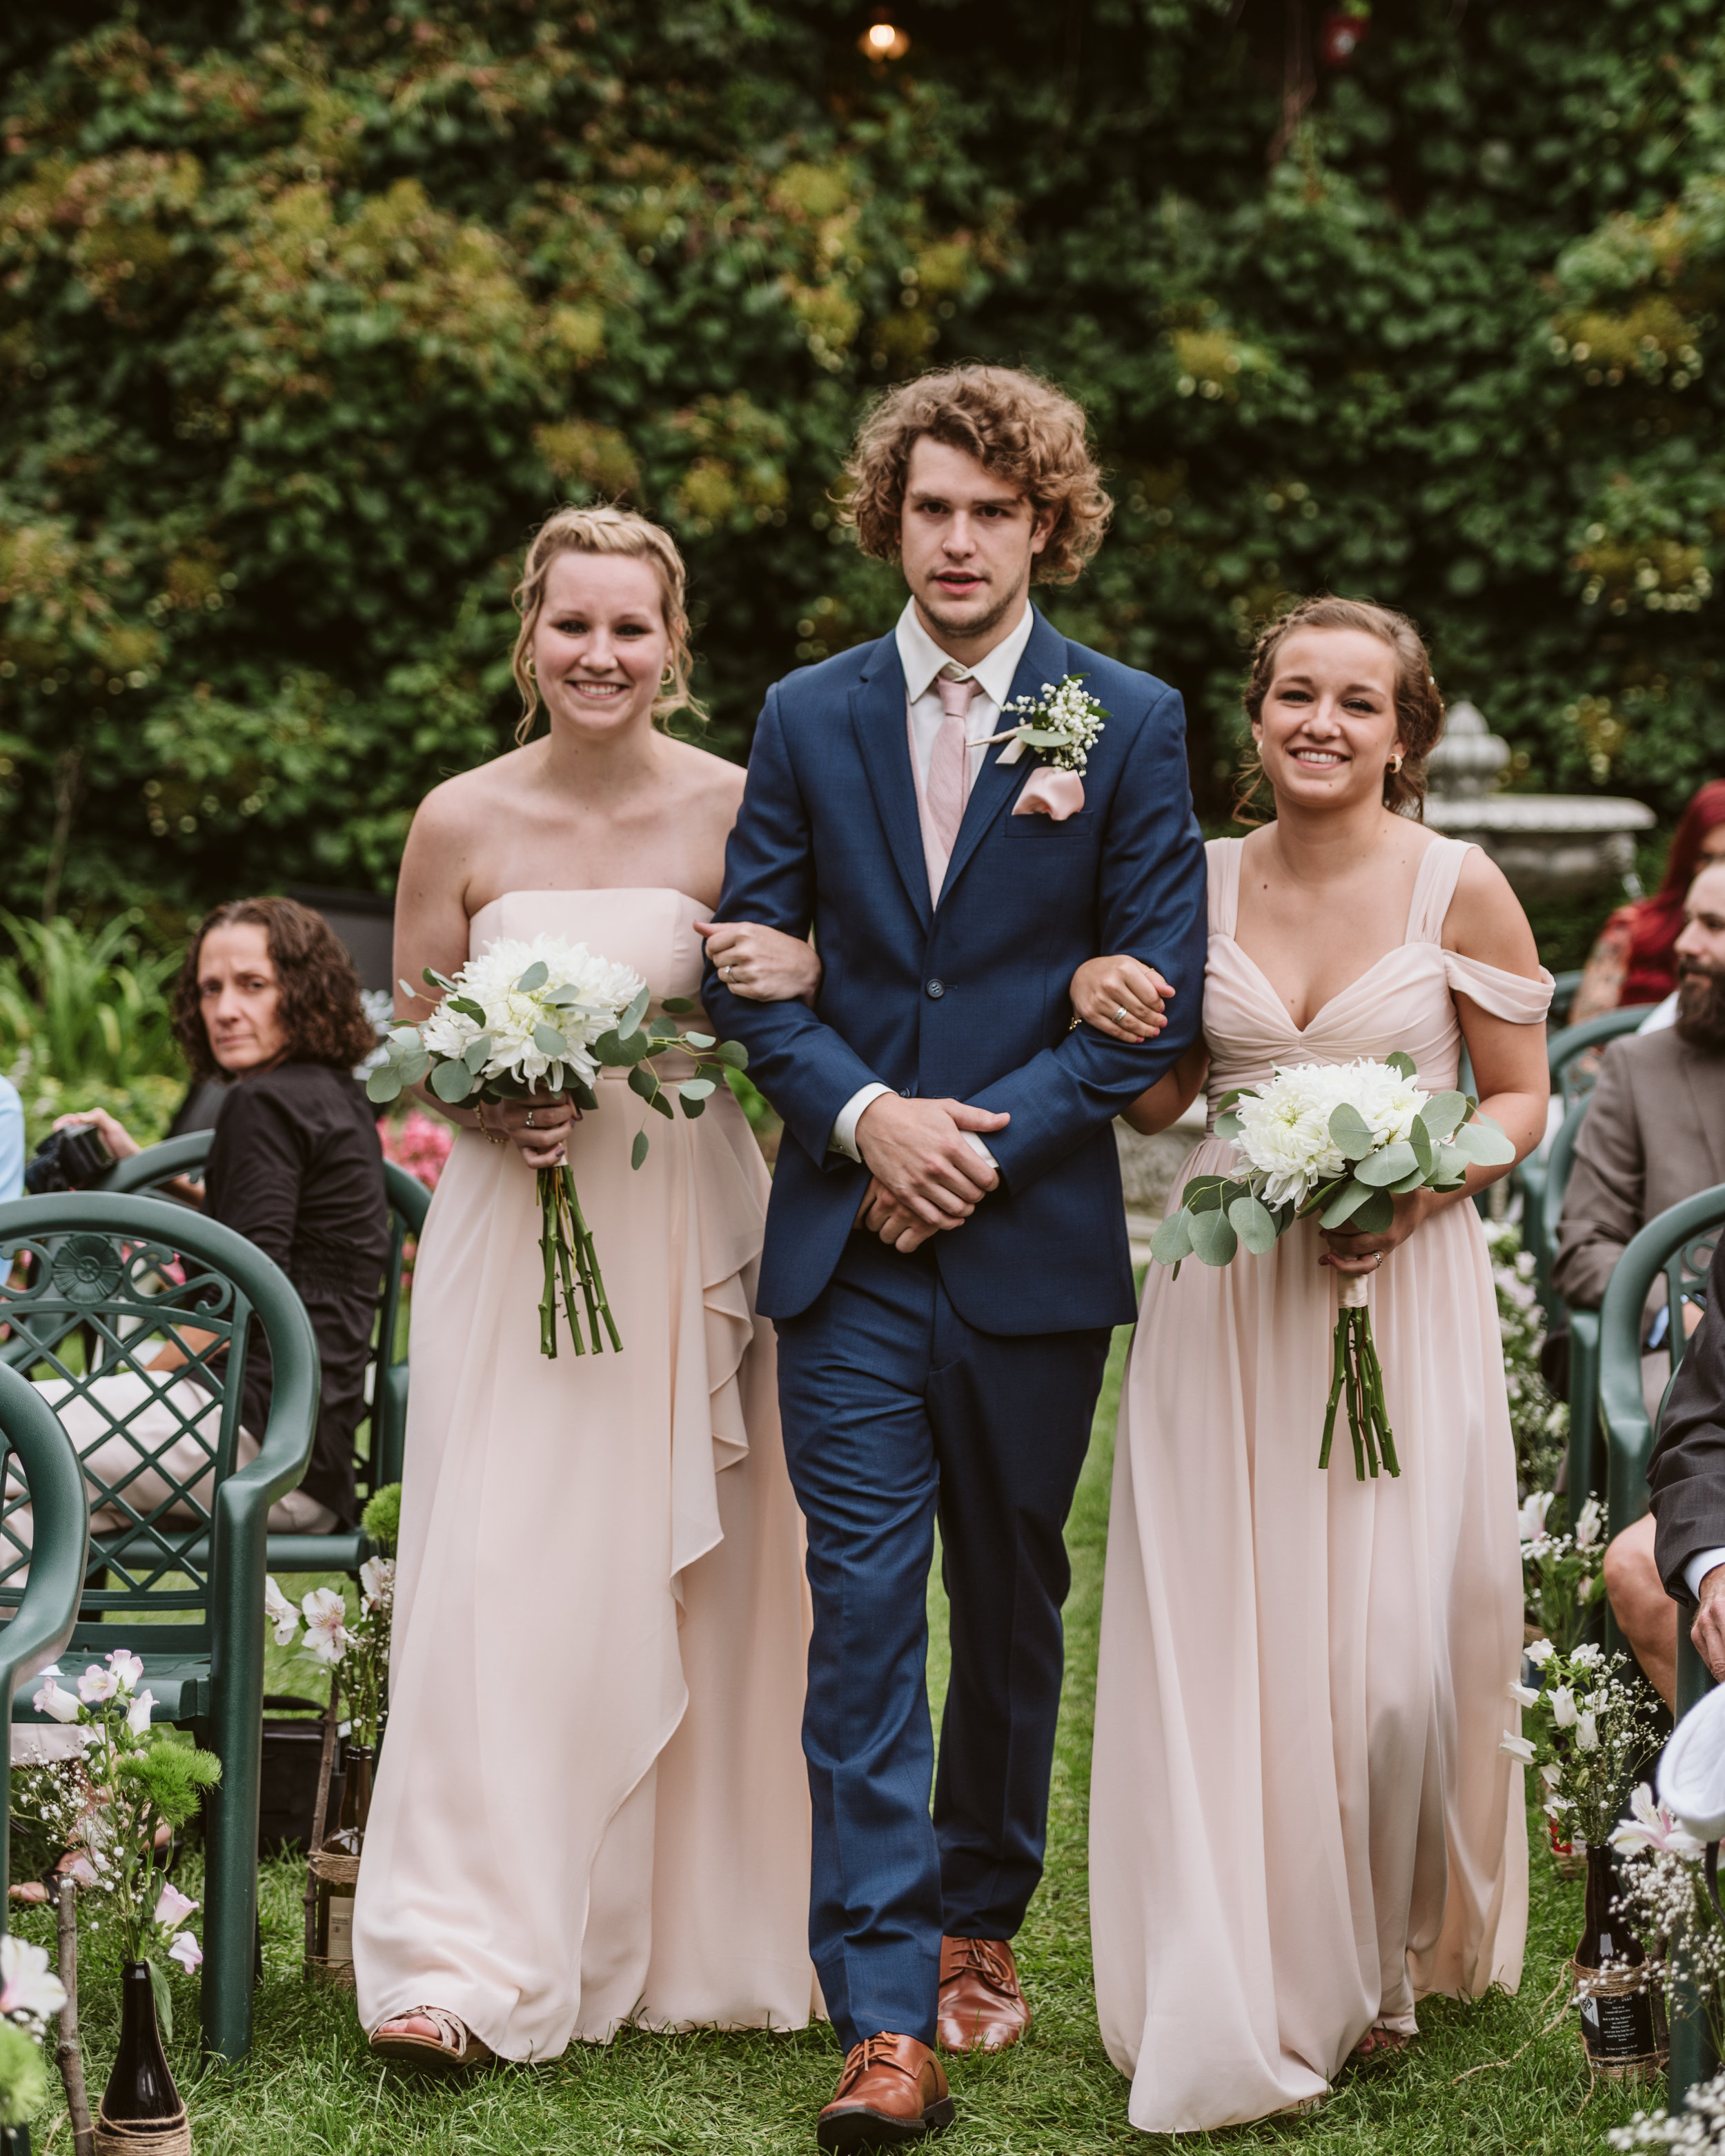 Horticultural_Hall_Lake_Geneva_wedding_Gavyn_Taylor_Photo_447.JPG